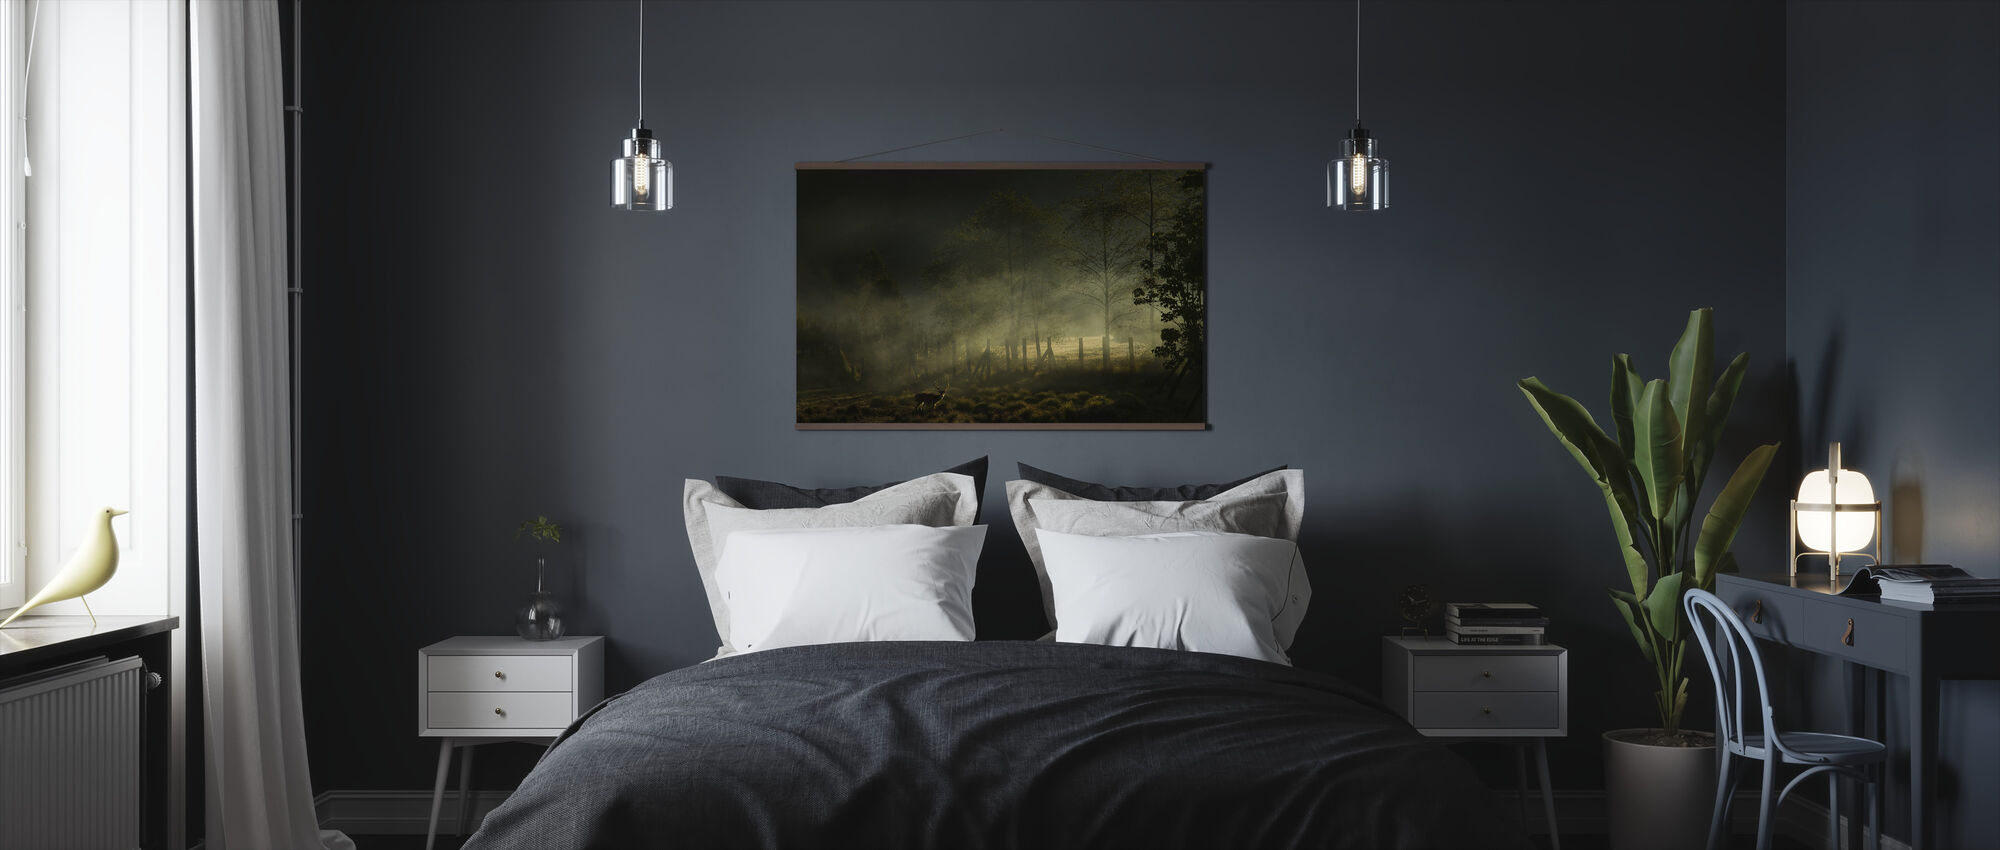 Misty ochtend - Poster - Slaapkamer